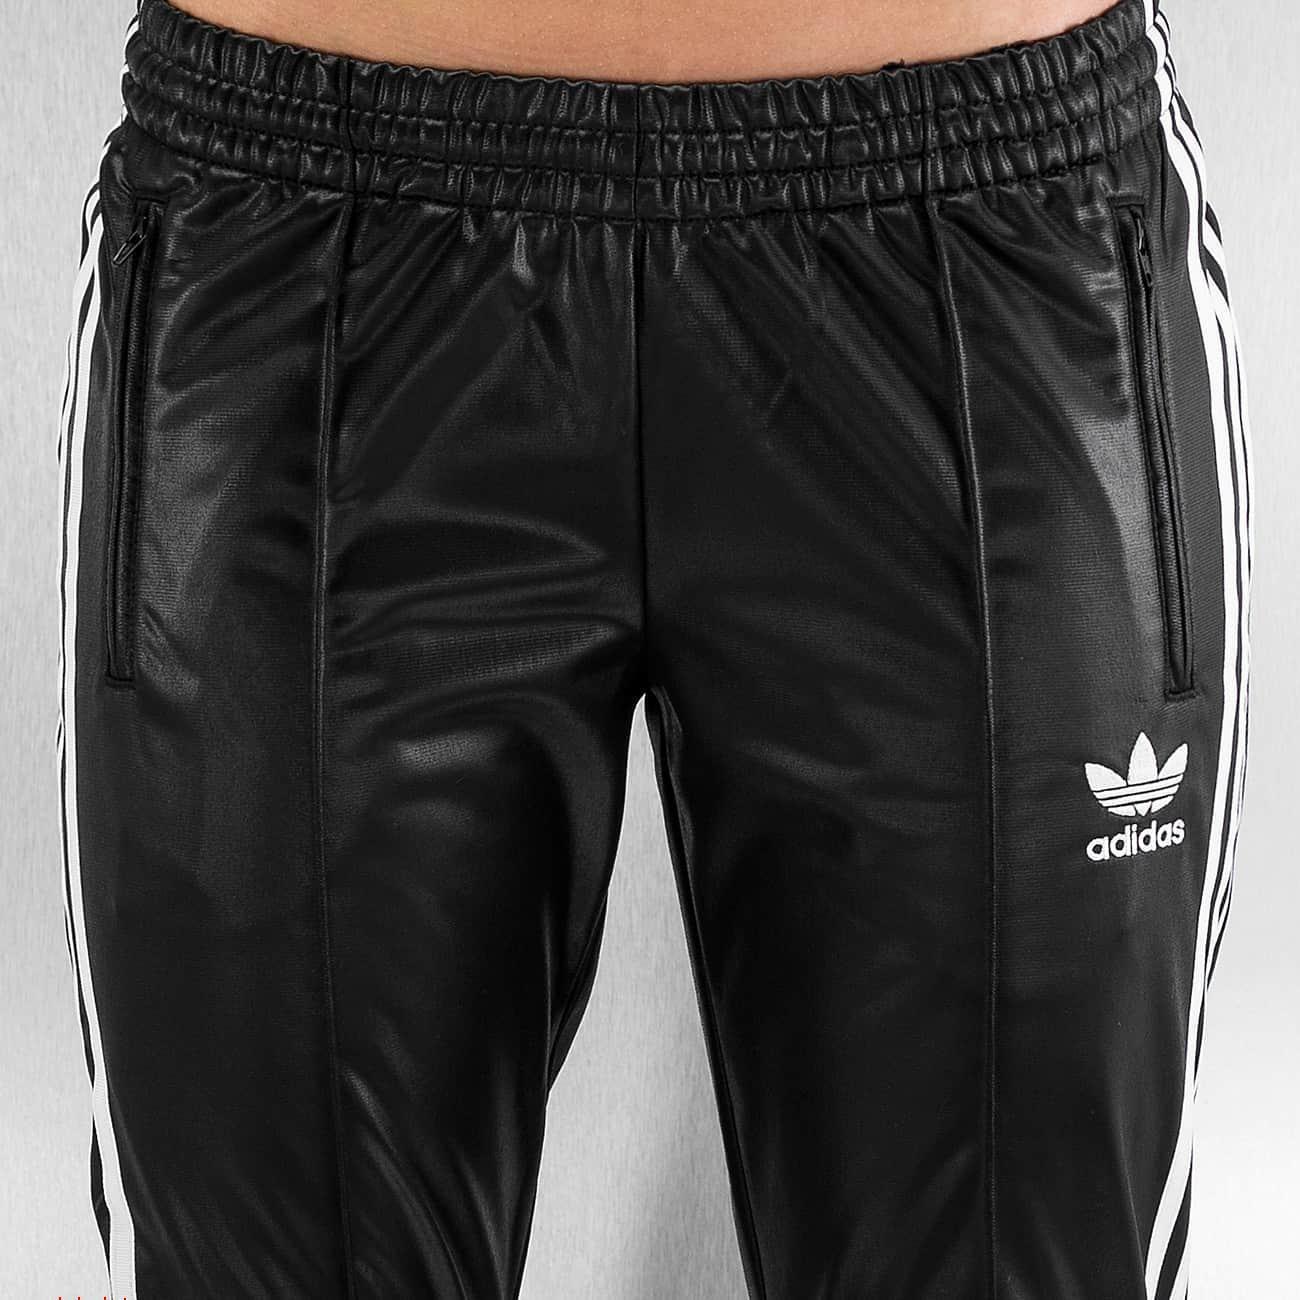 Details about SMALL adidas Originals Women's WET look SUPERGIRL TRACK PANTS U.S. SZ:4 1AVL